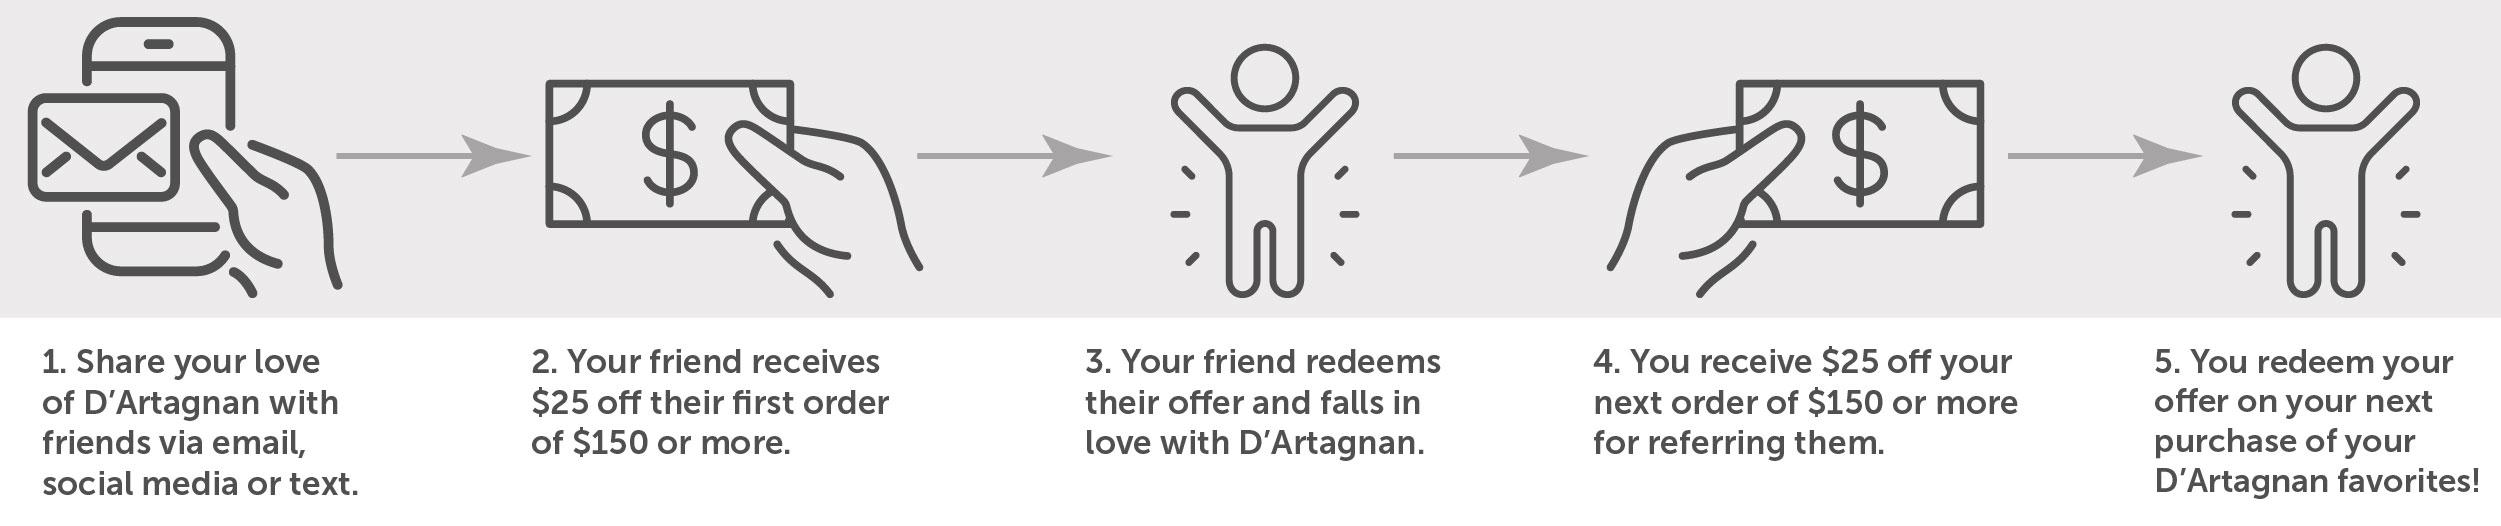 referral-program-banner-how-to